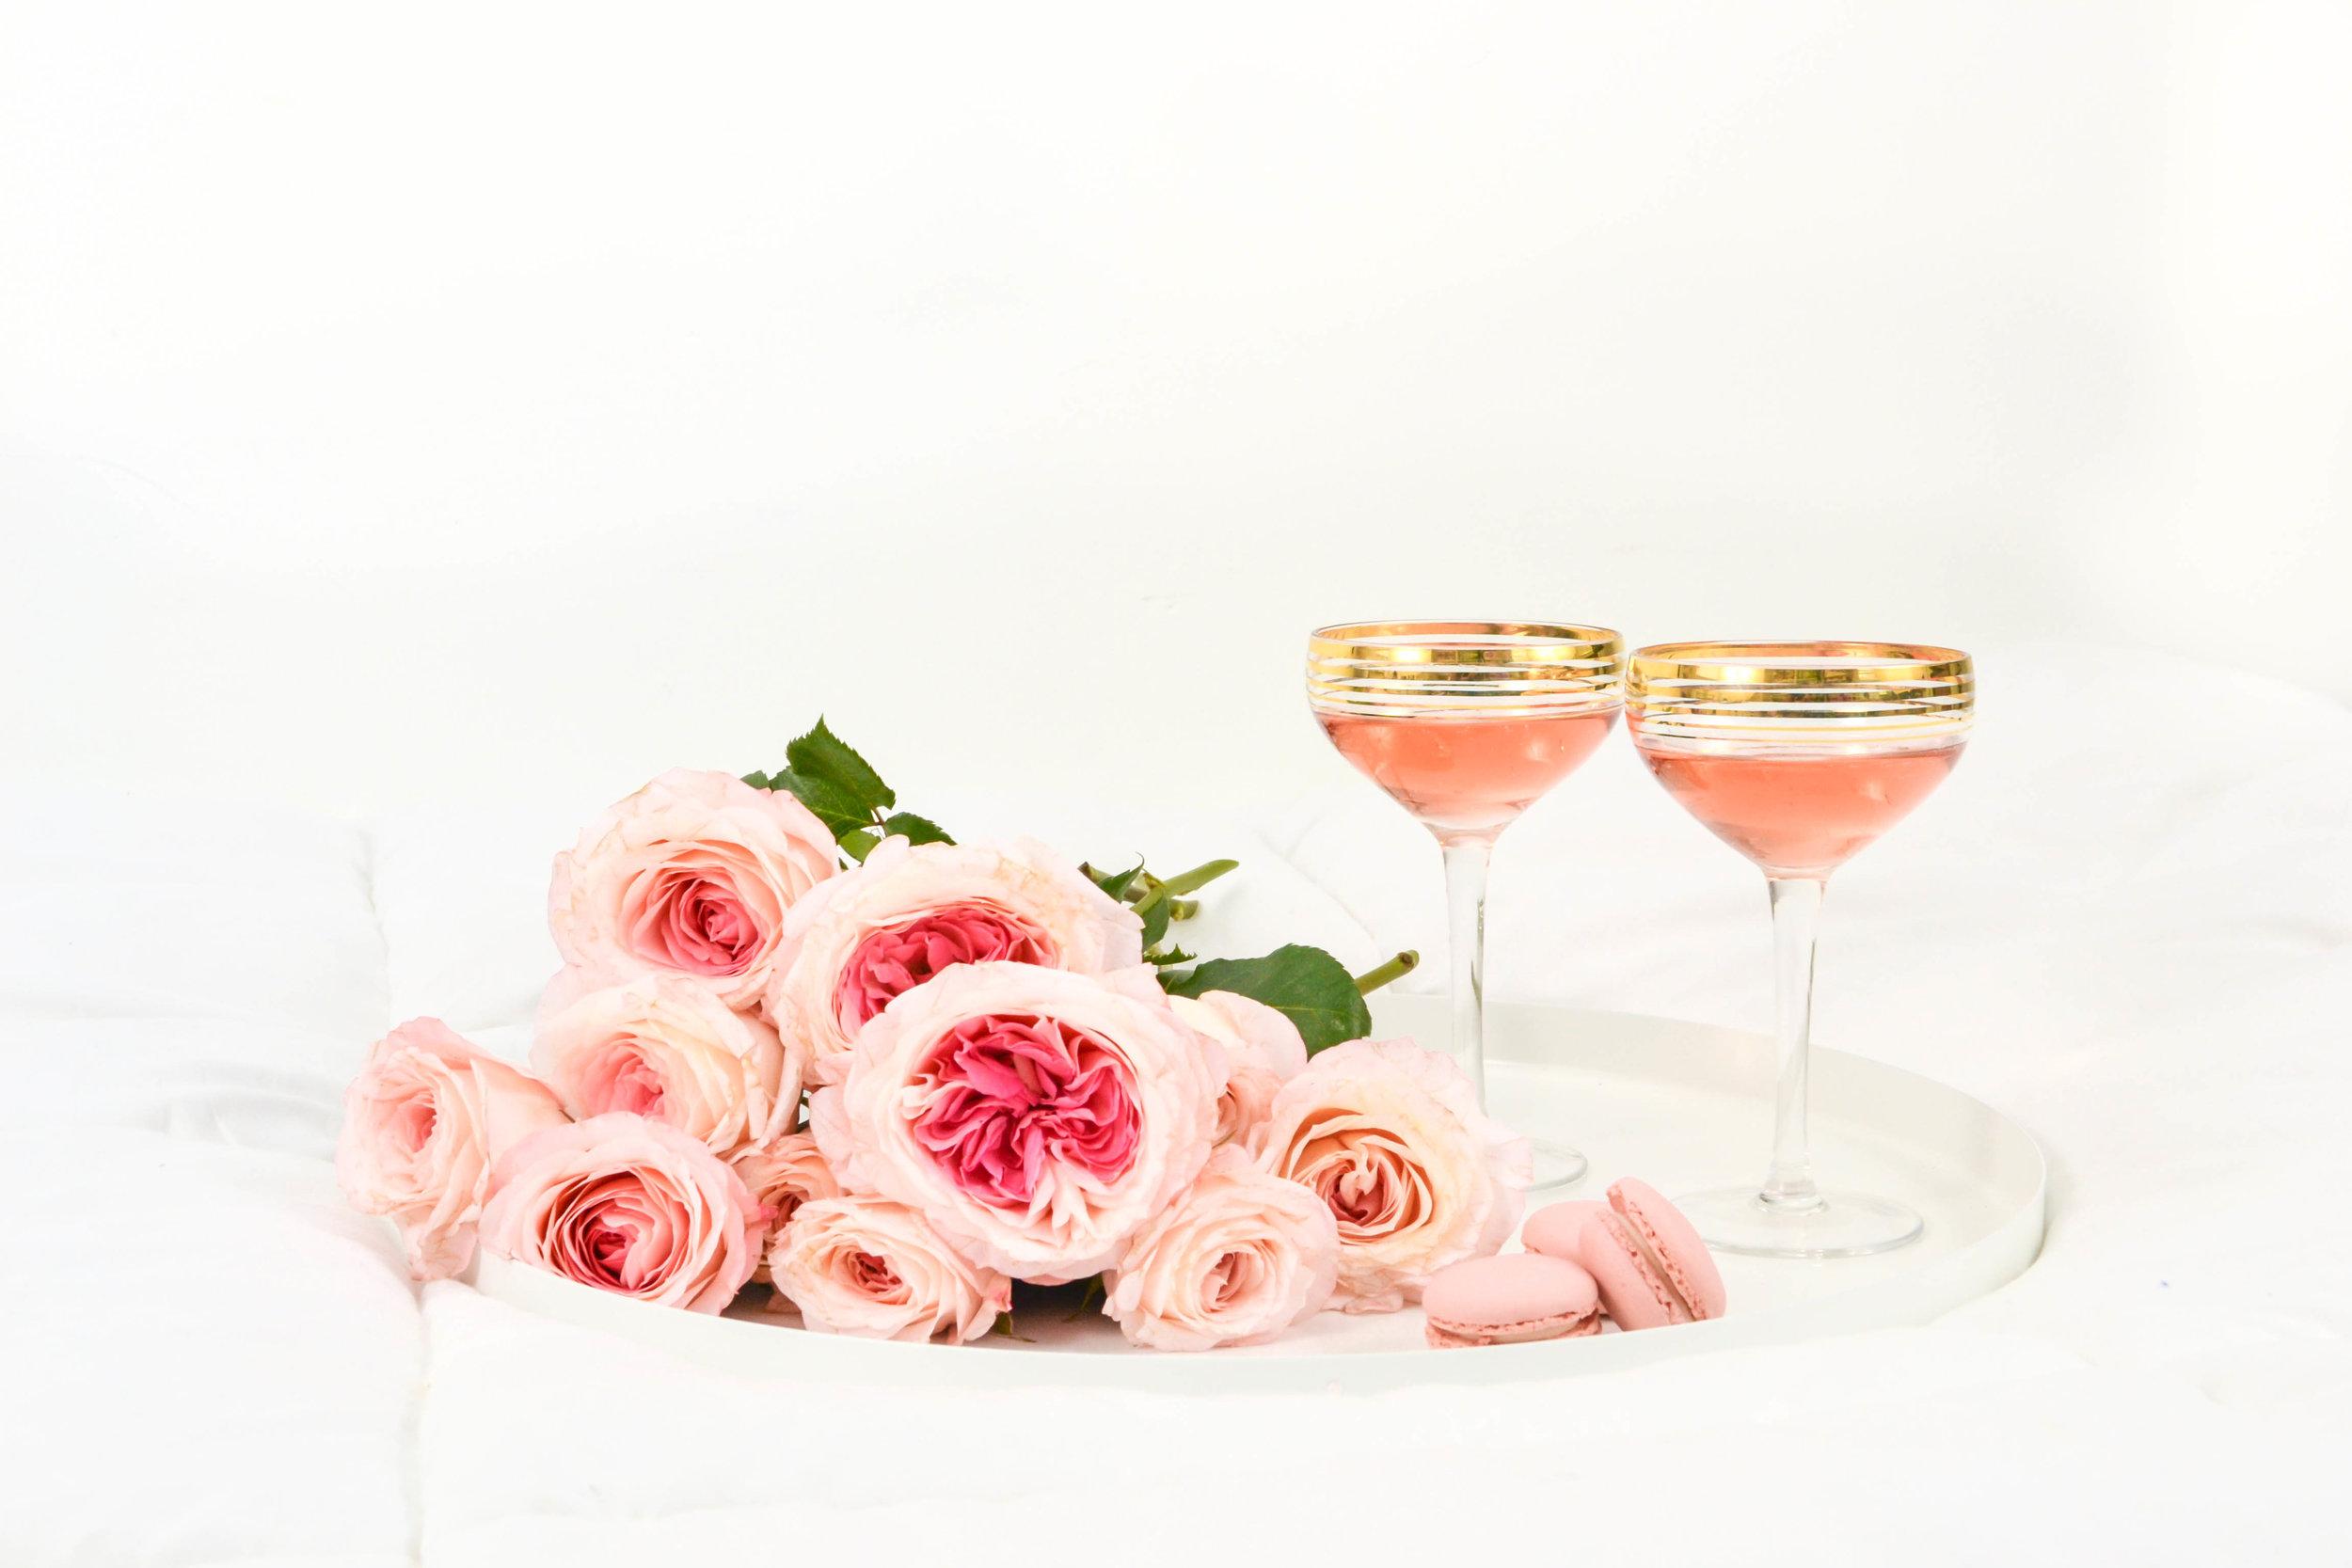 c103-Blush-Pink-Fempreneur-17.jpg